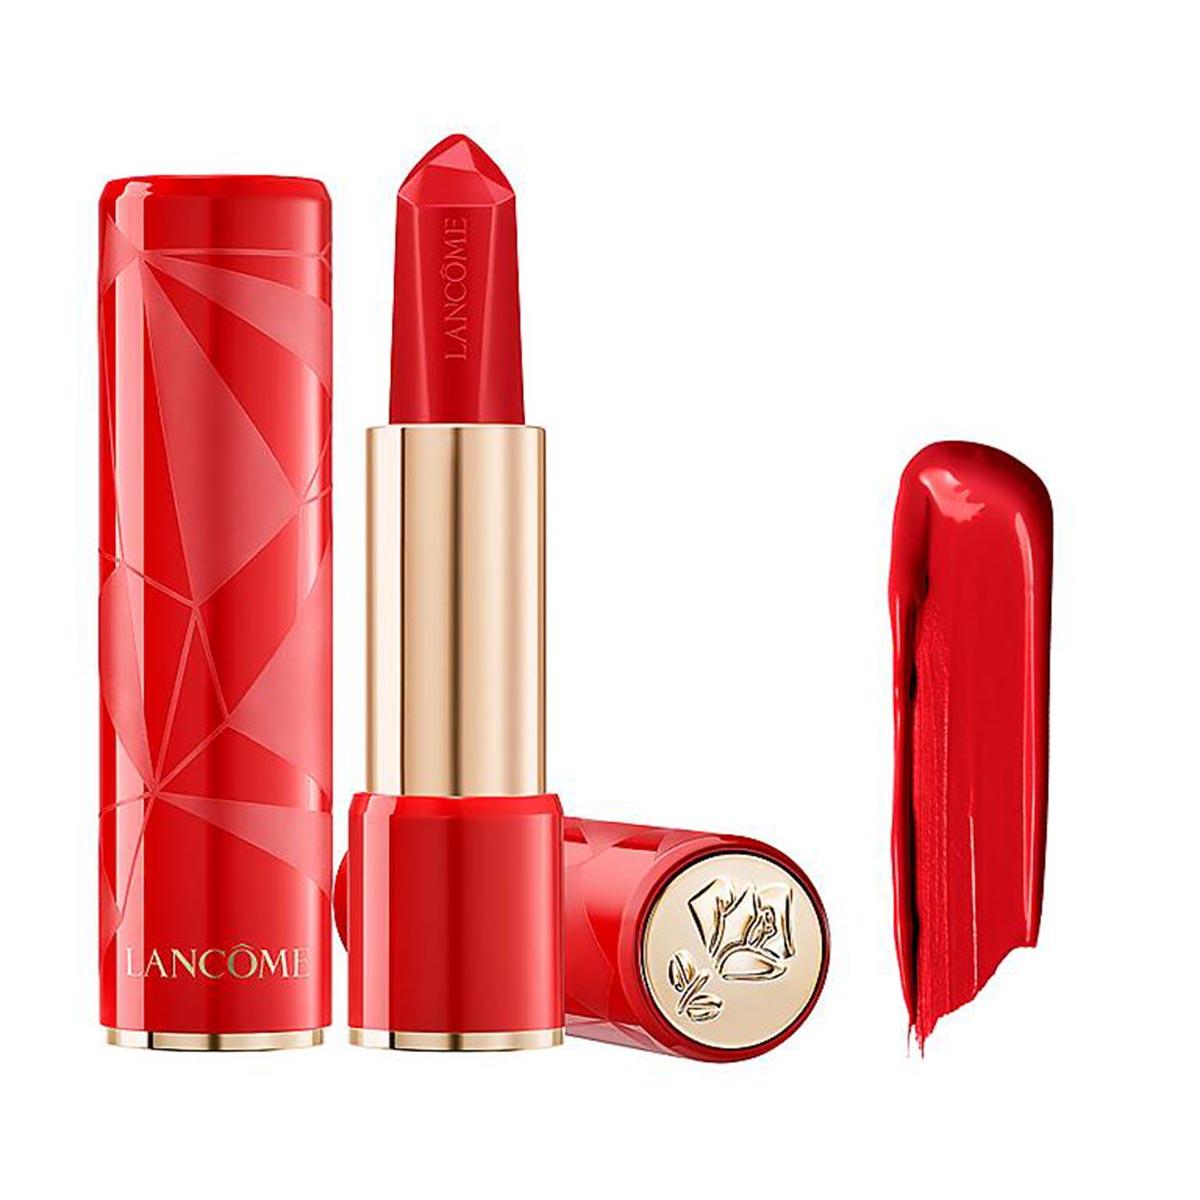 Lancome absolu rouge ruby cream lipstick 01 bad blood ruby edicion limitada